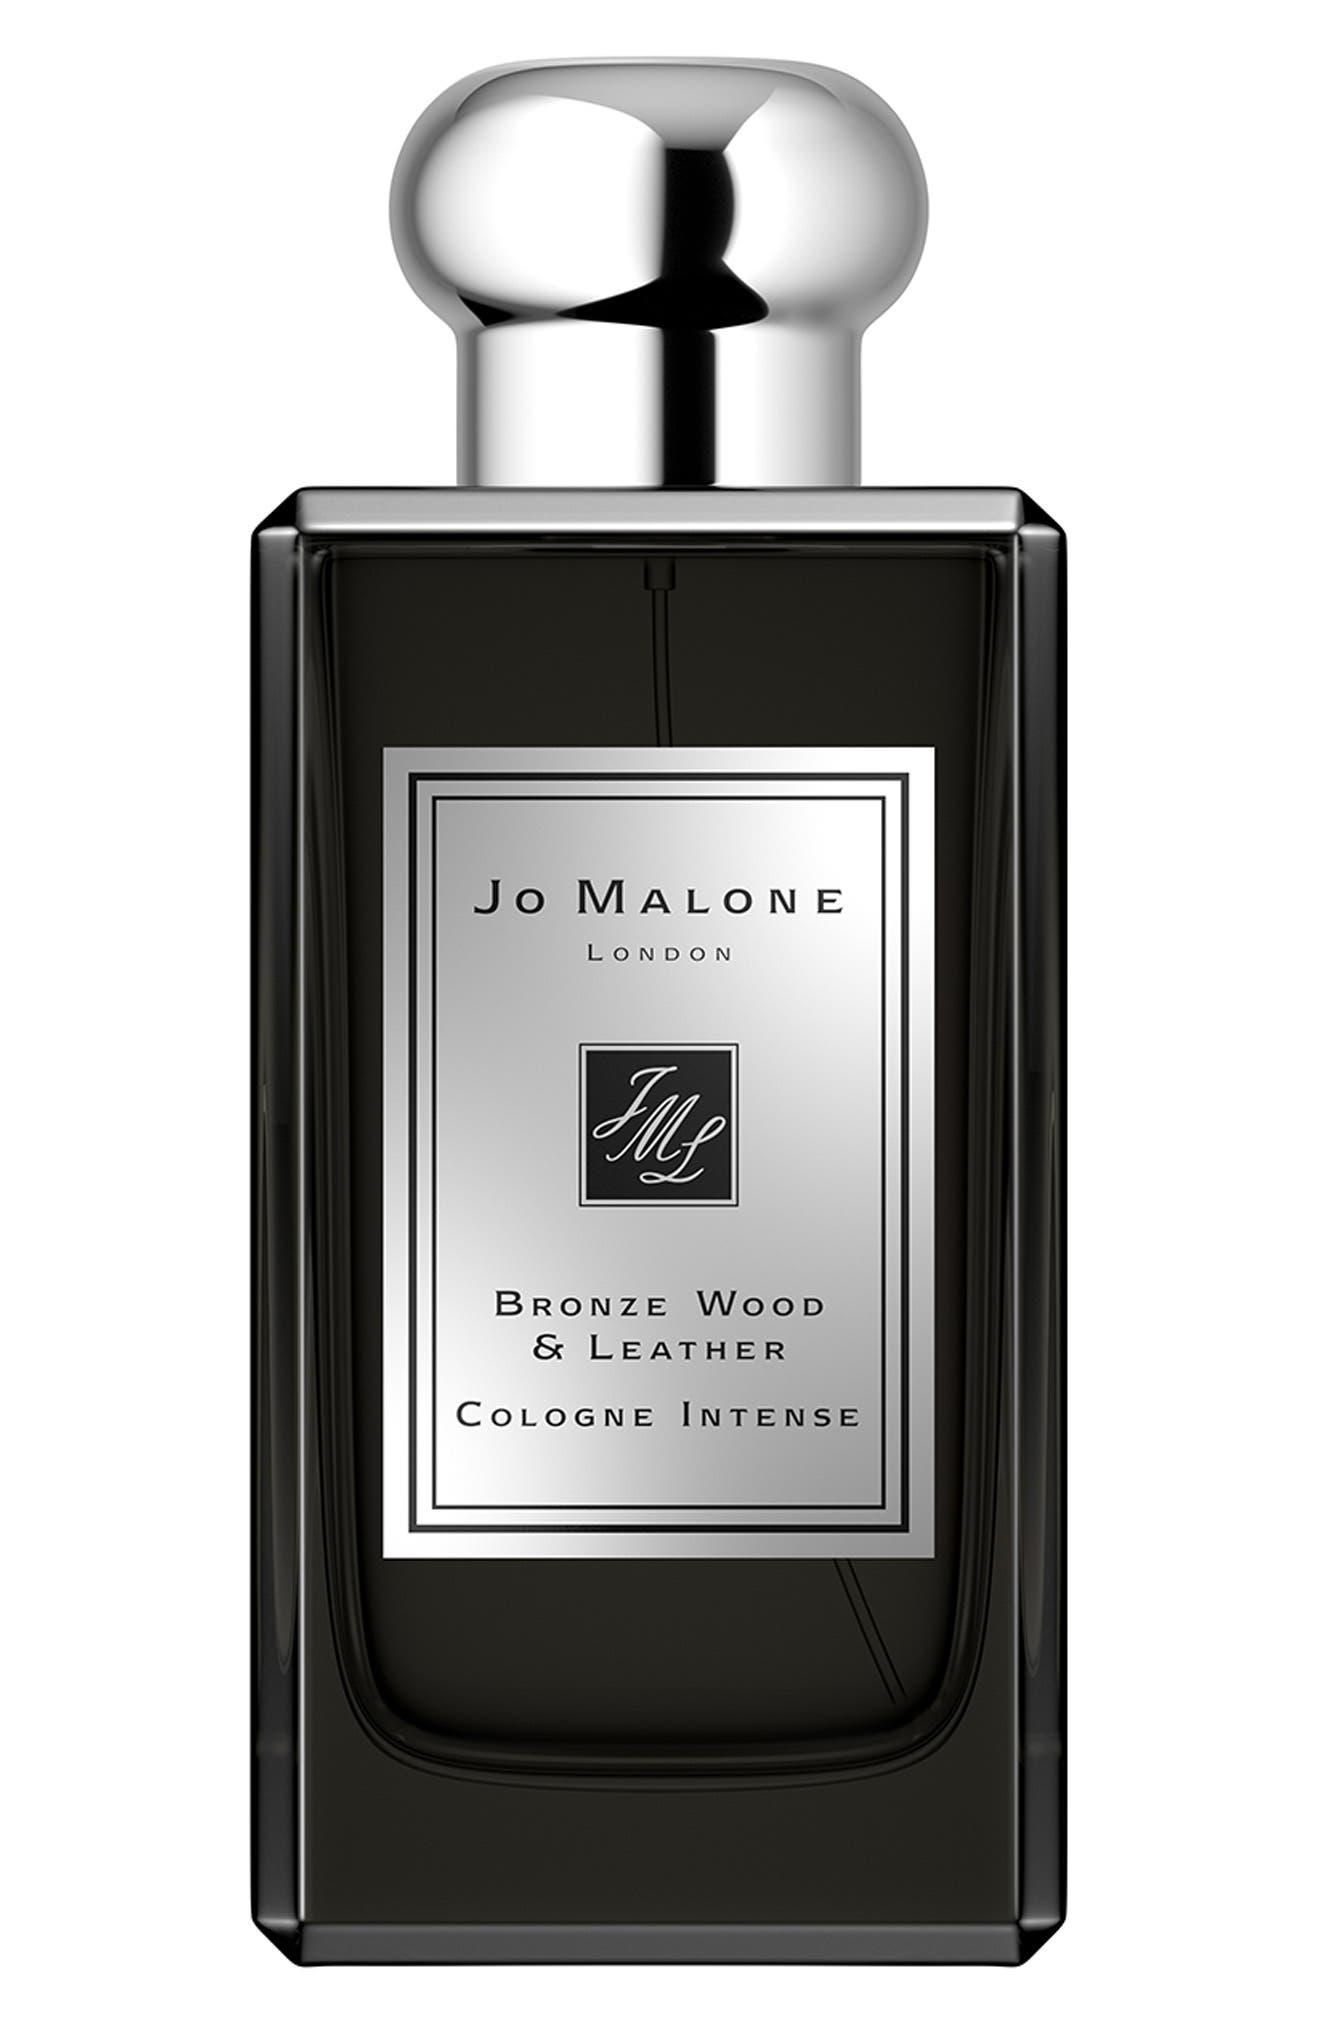 Jo Malone London(TM) Bronze Wood & Leather Cologne Intense